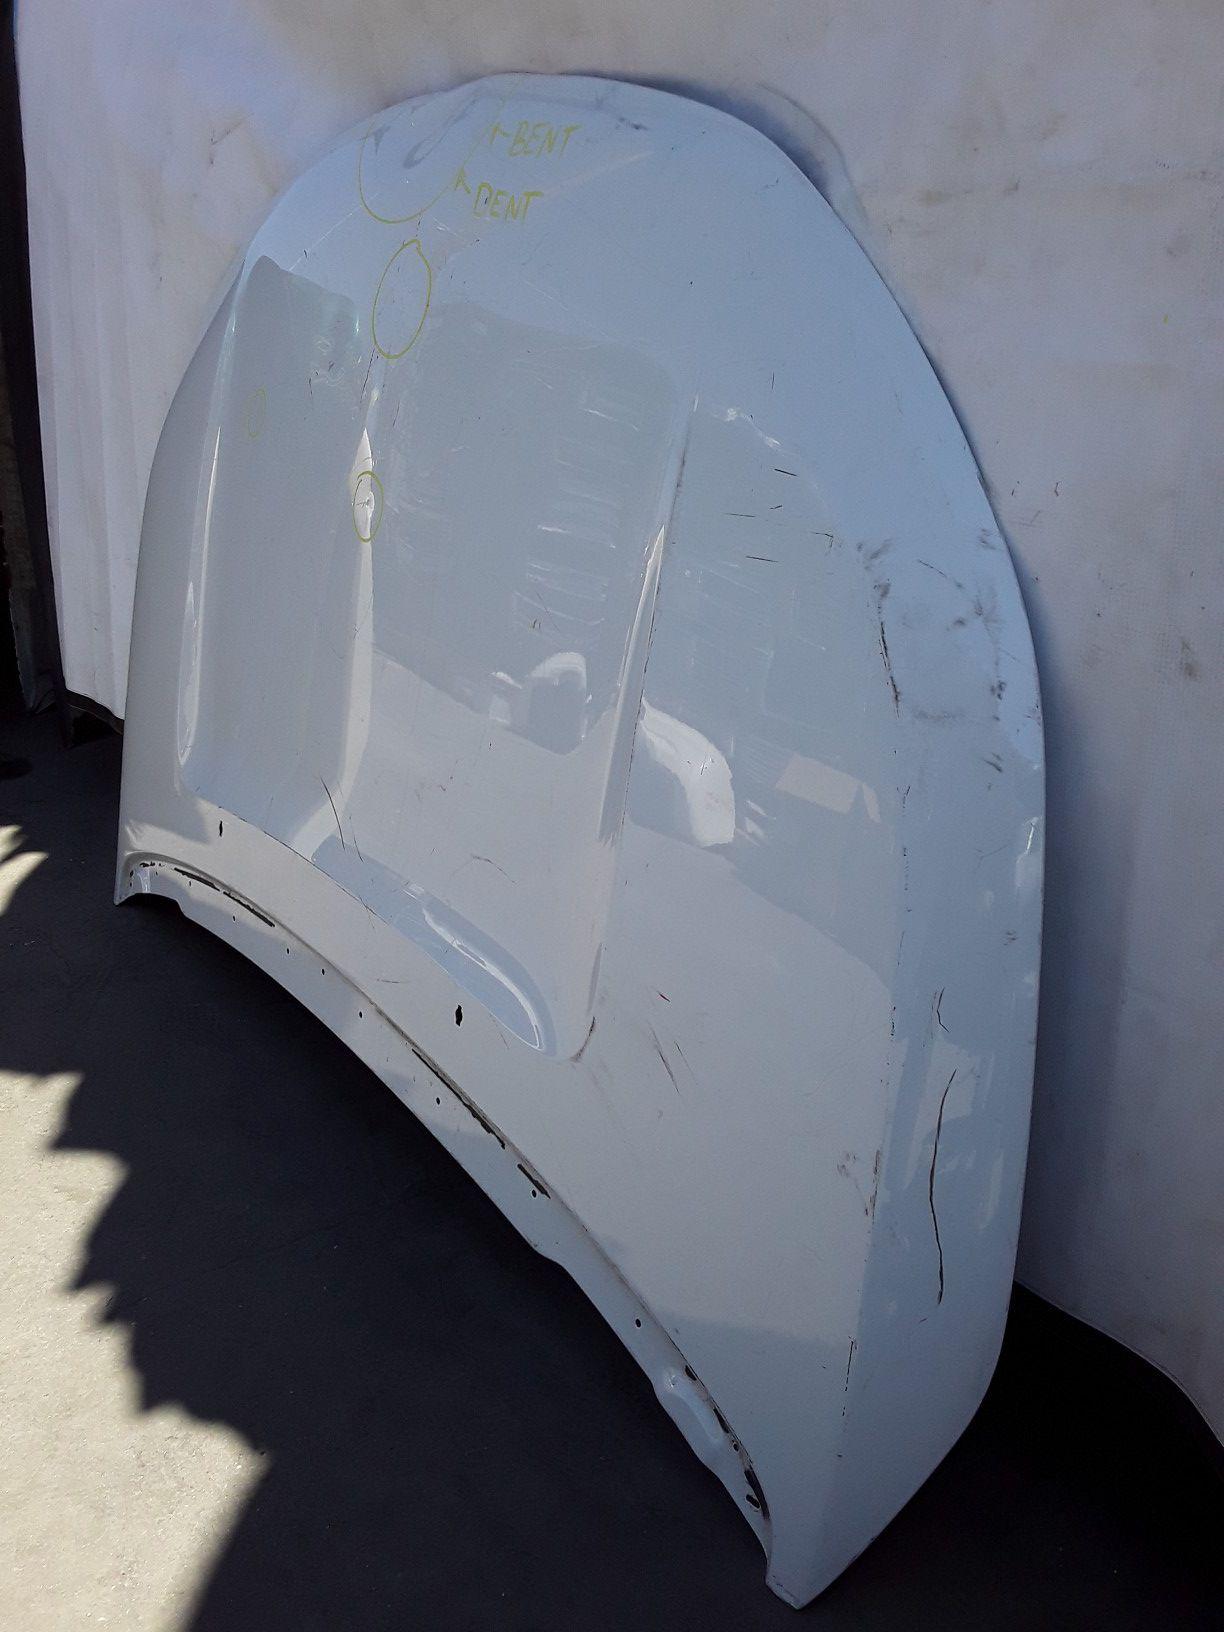 2011-2015 Chevy volt used OEM hood